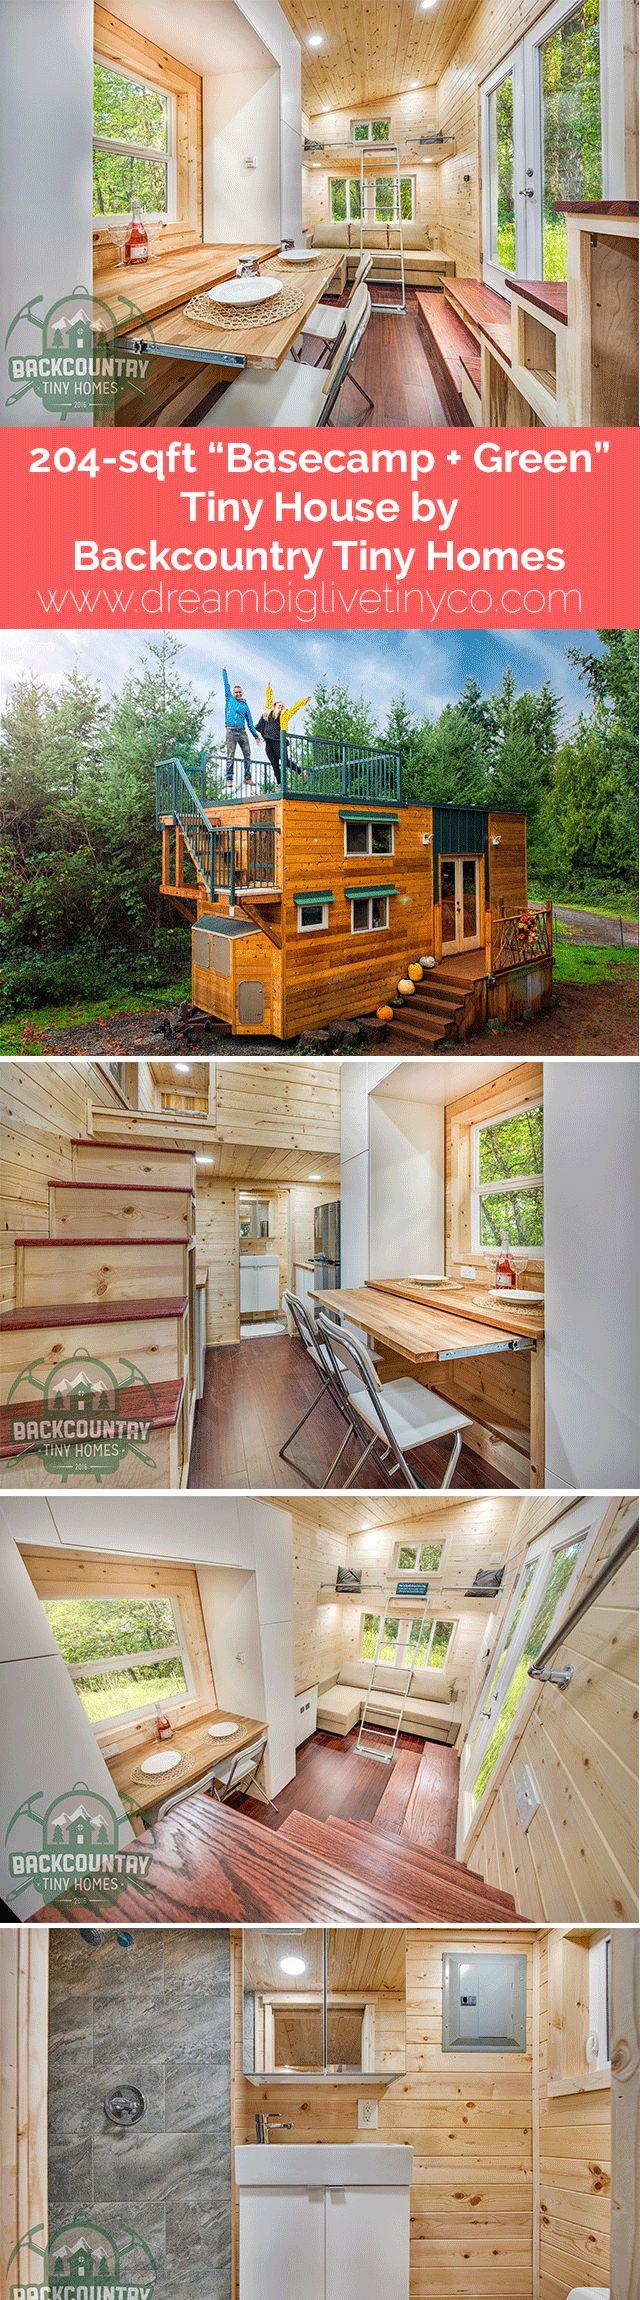 "204-sqft ""Basecamp + Green"" Tiny House by Backcountry Tiny Homes"